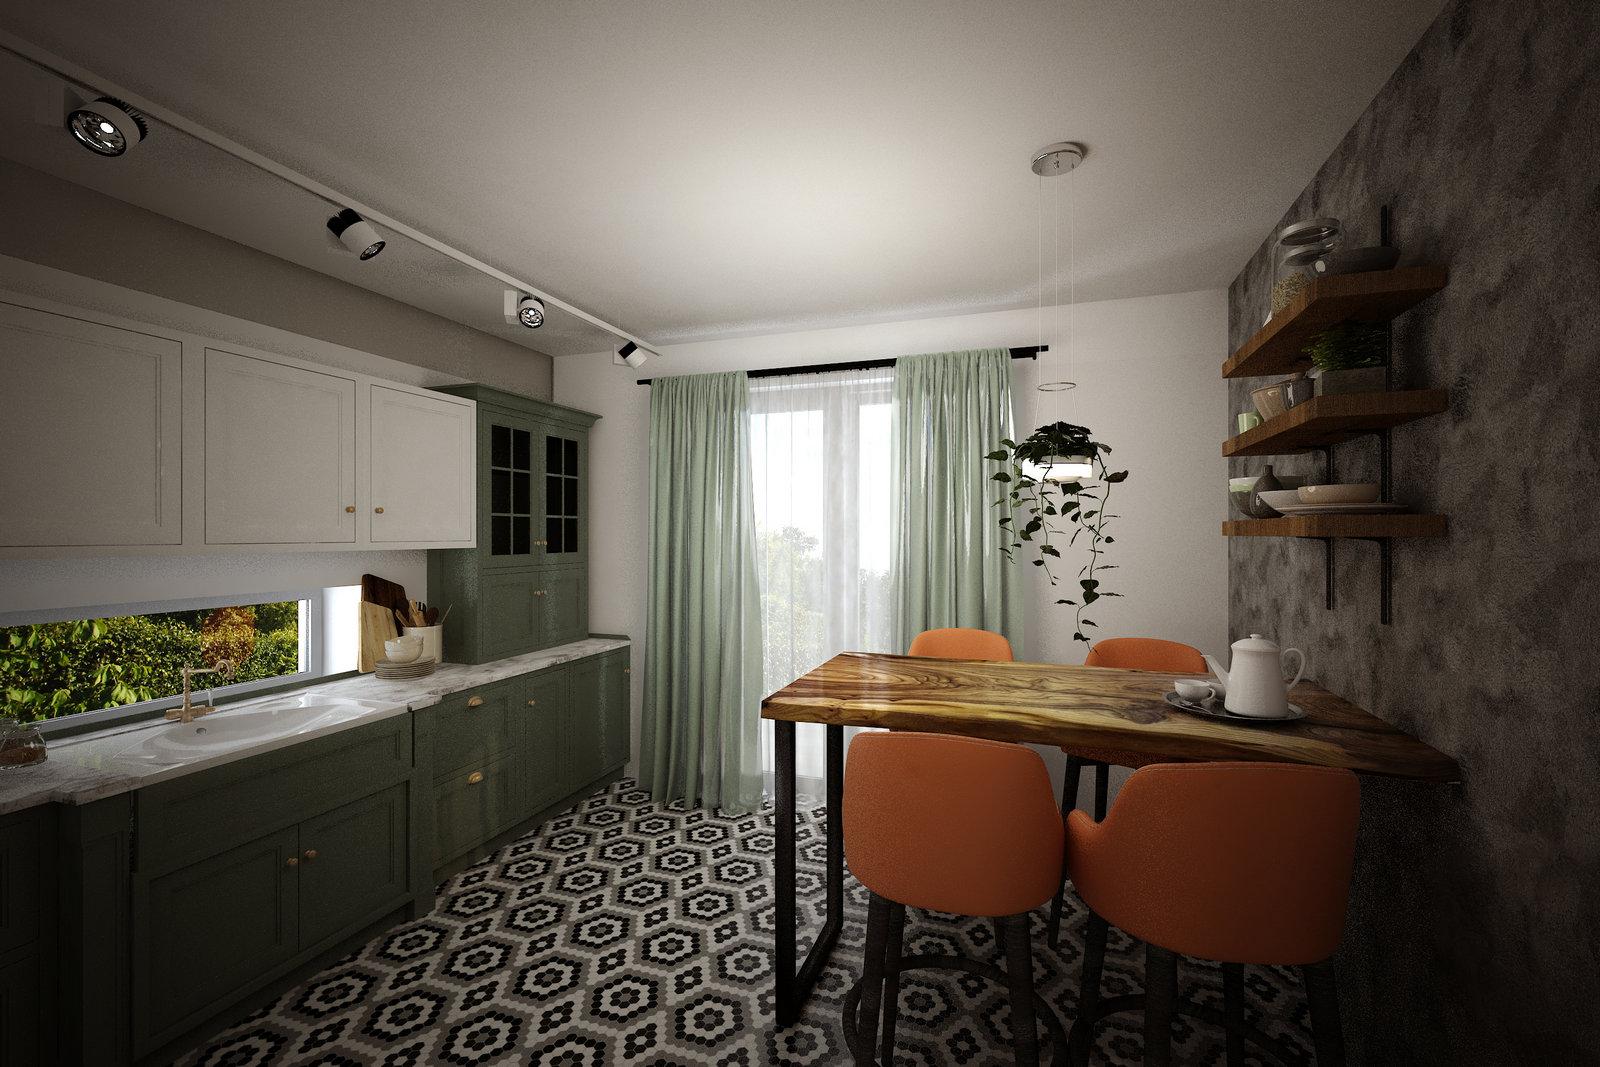 Фото — Интерьер ДОМа ТЕХНОНИКОЛЬ на Open Village — кухня